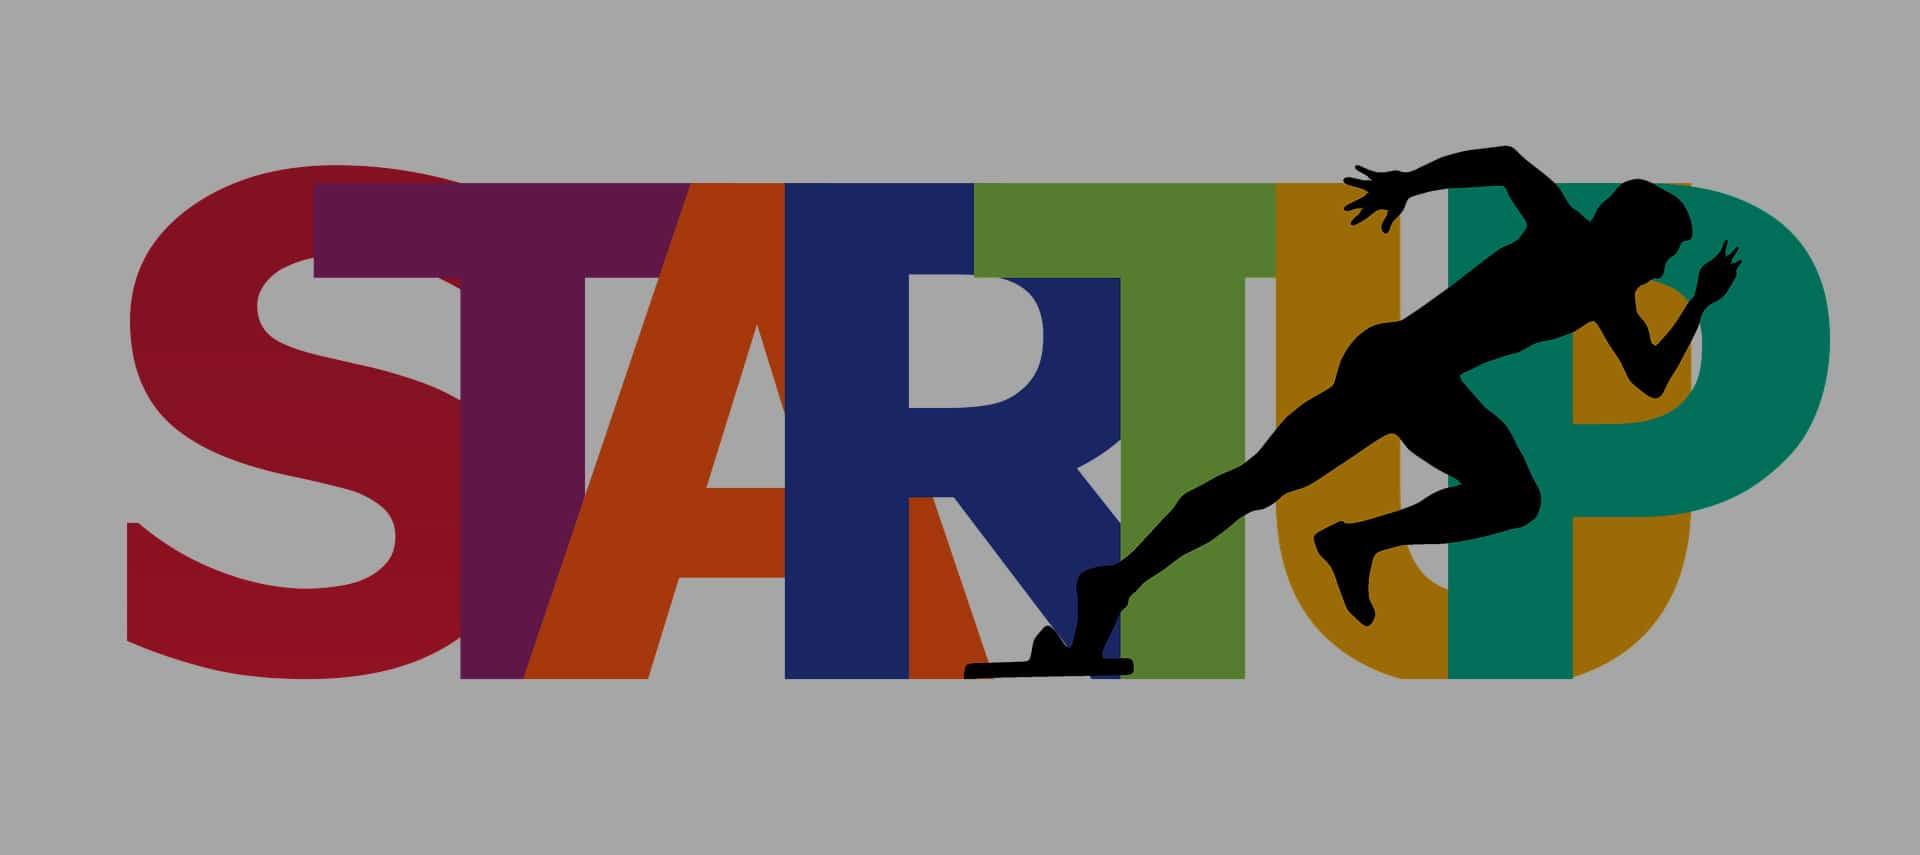 Rebrand Arts